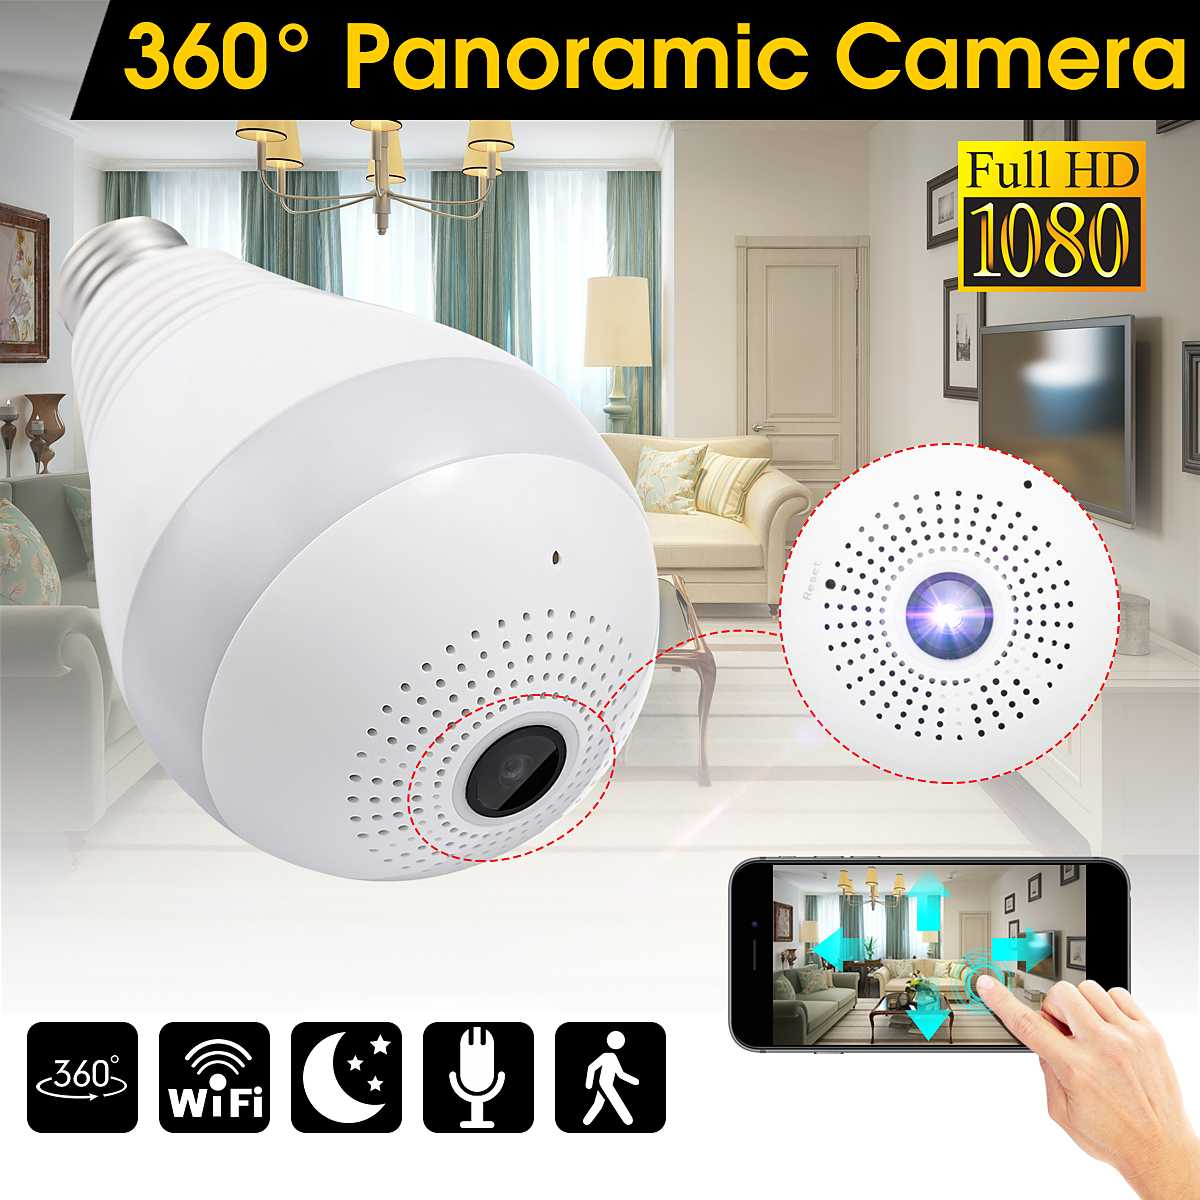 360 Degree Wireless IP Light Camera 1080P E27 Bulb Lamp Panoramic FishEye Smart Home Monitor Alarm CCTV WiFi Security Camera